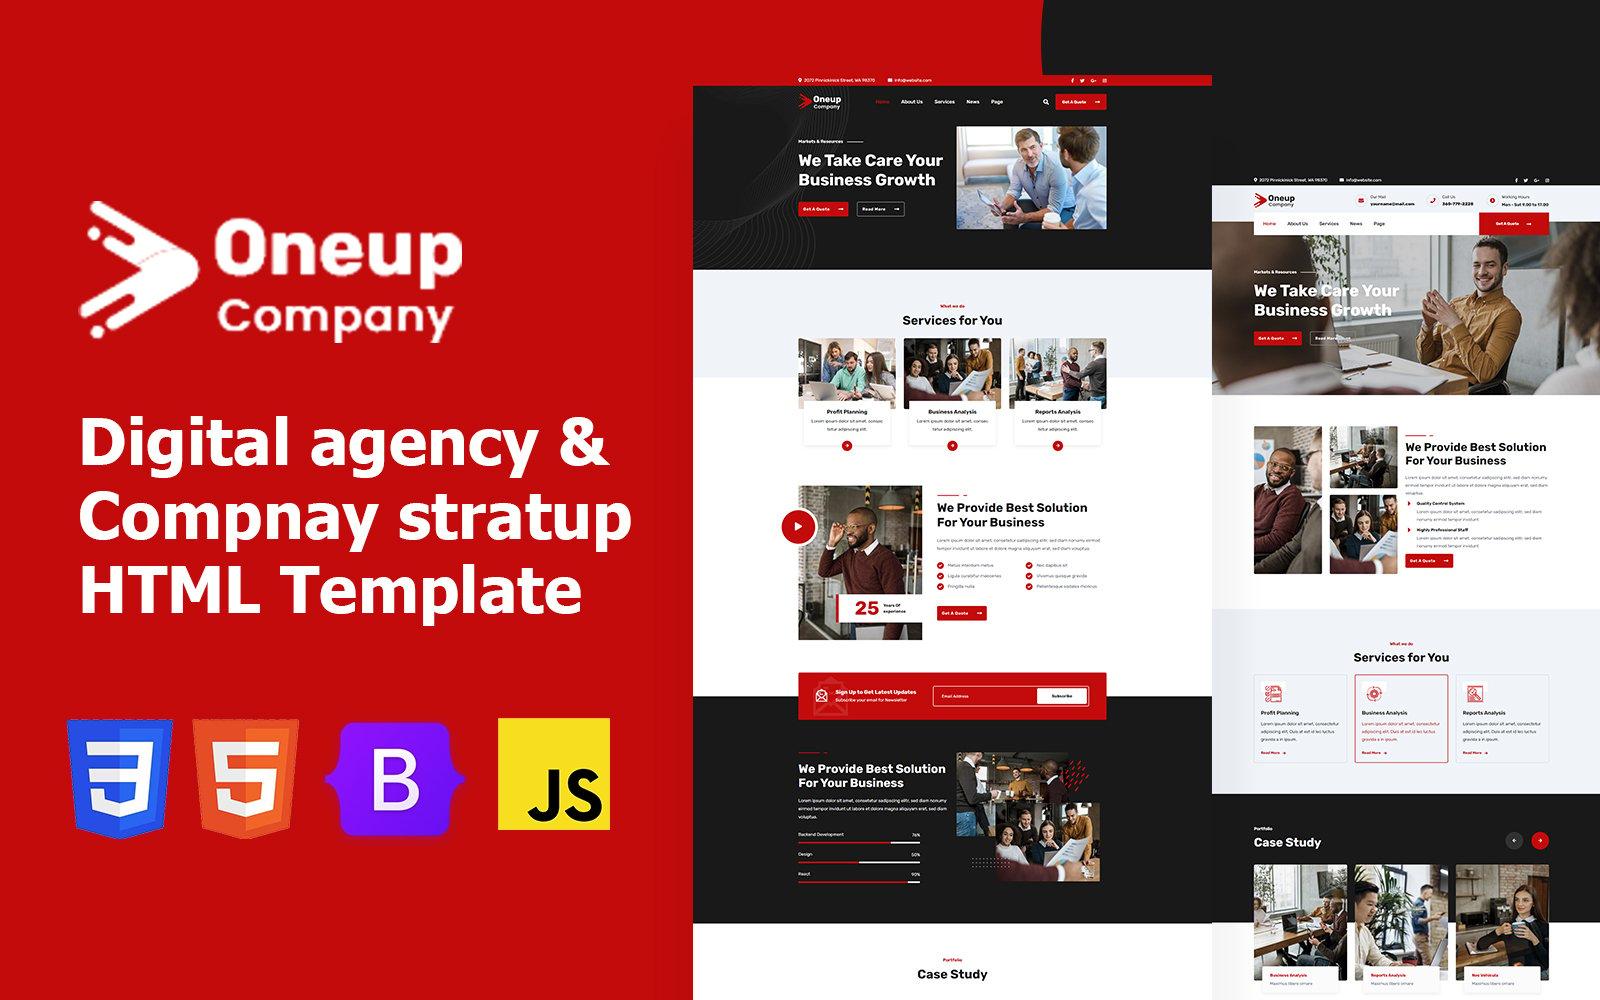 """Oneup Company - Digital Agency Html Website Template"" 响应式网页模板 #170166"